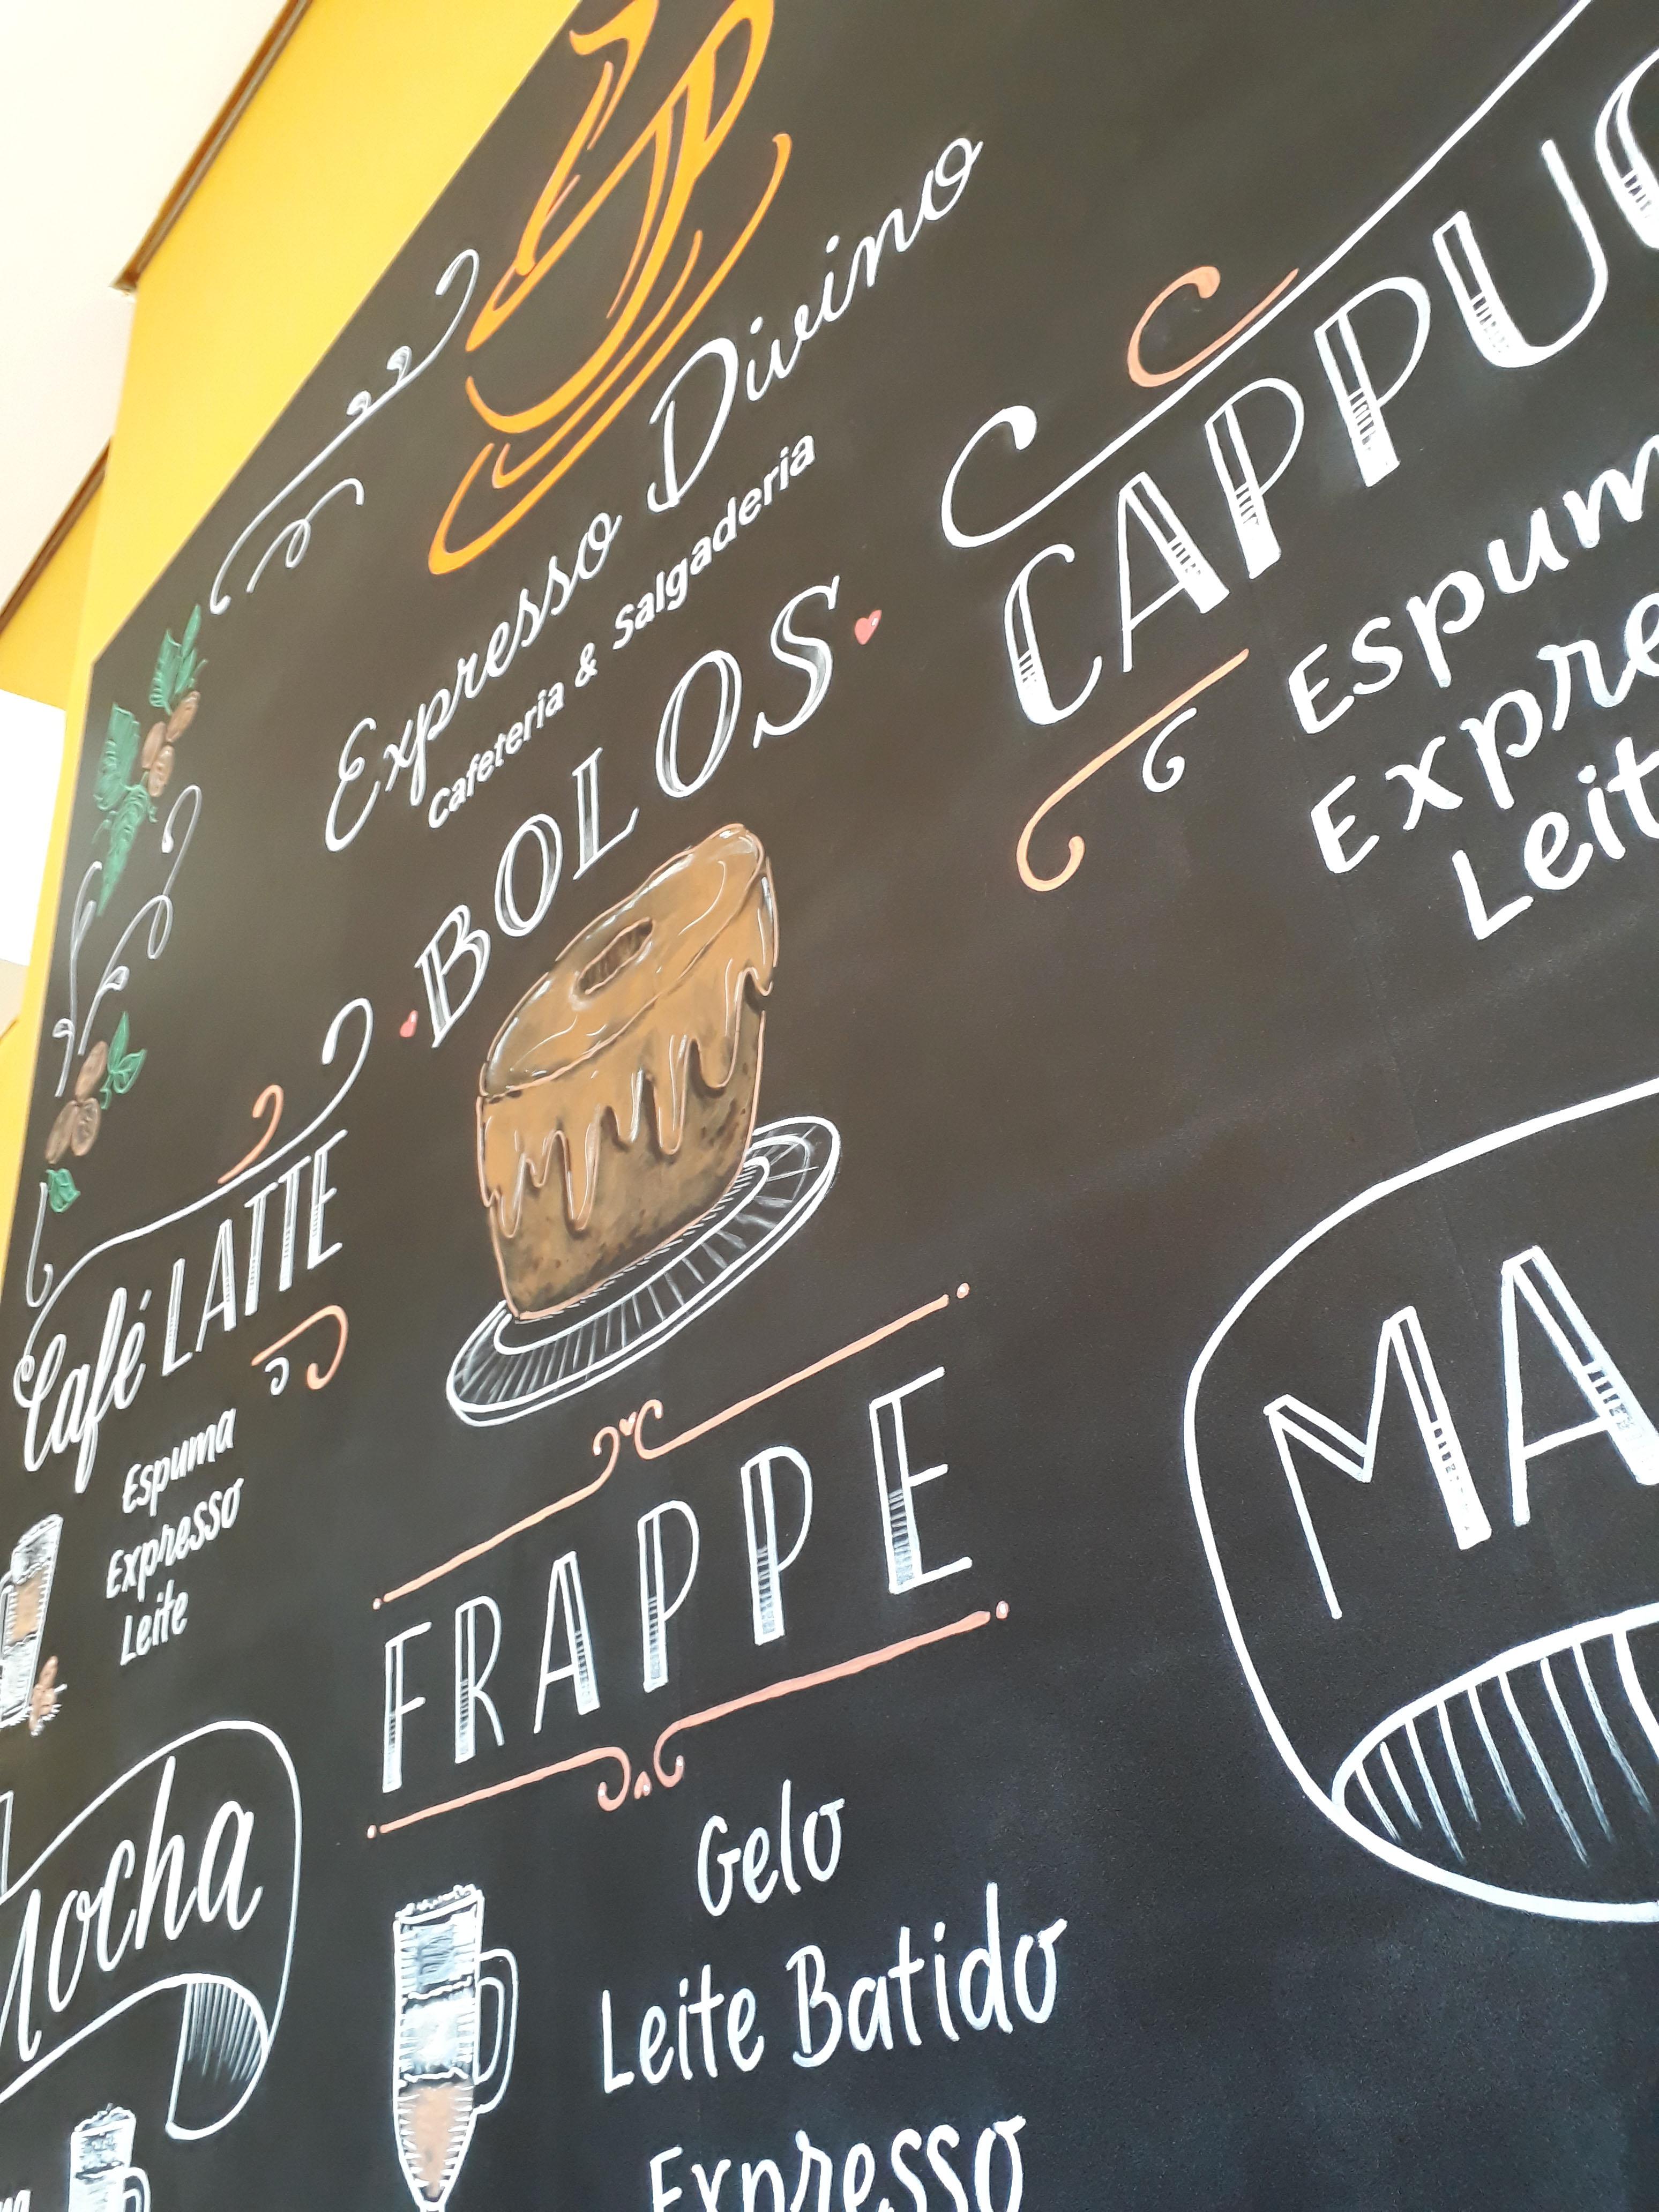 Cafeteria Expresso Divino - Jun19